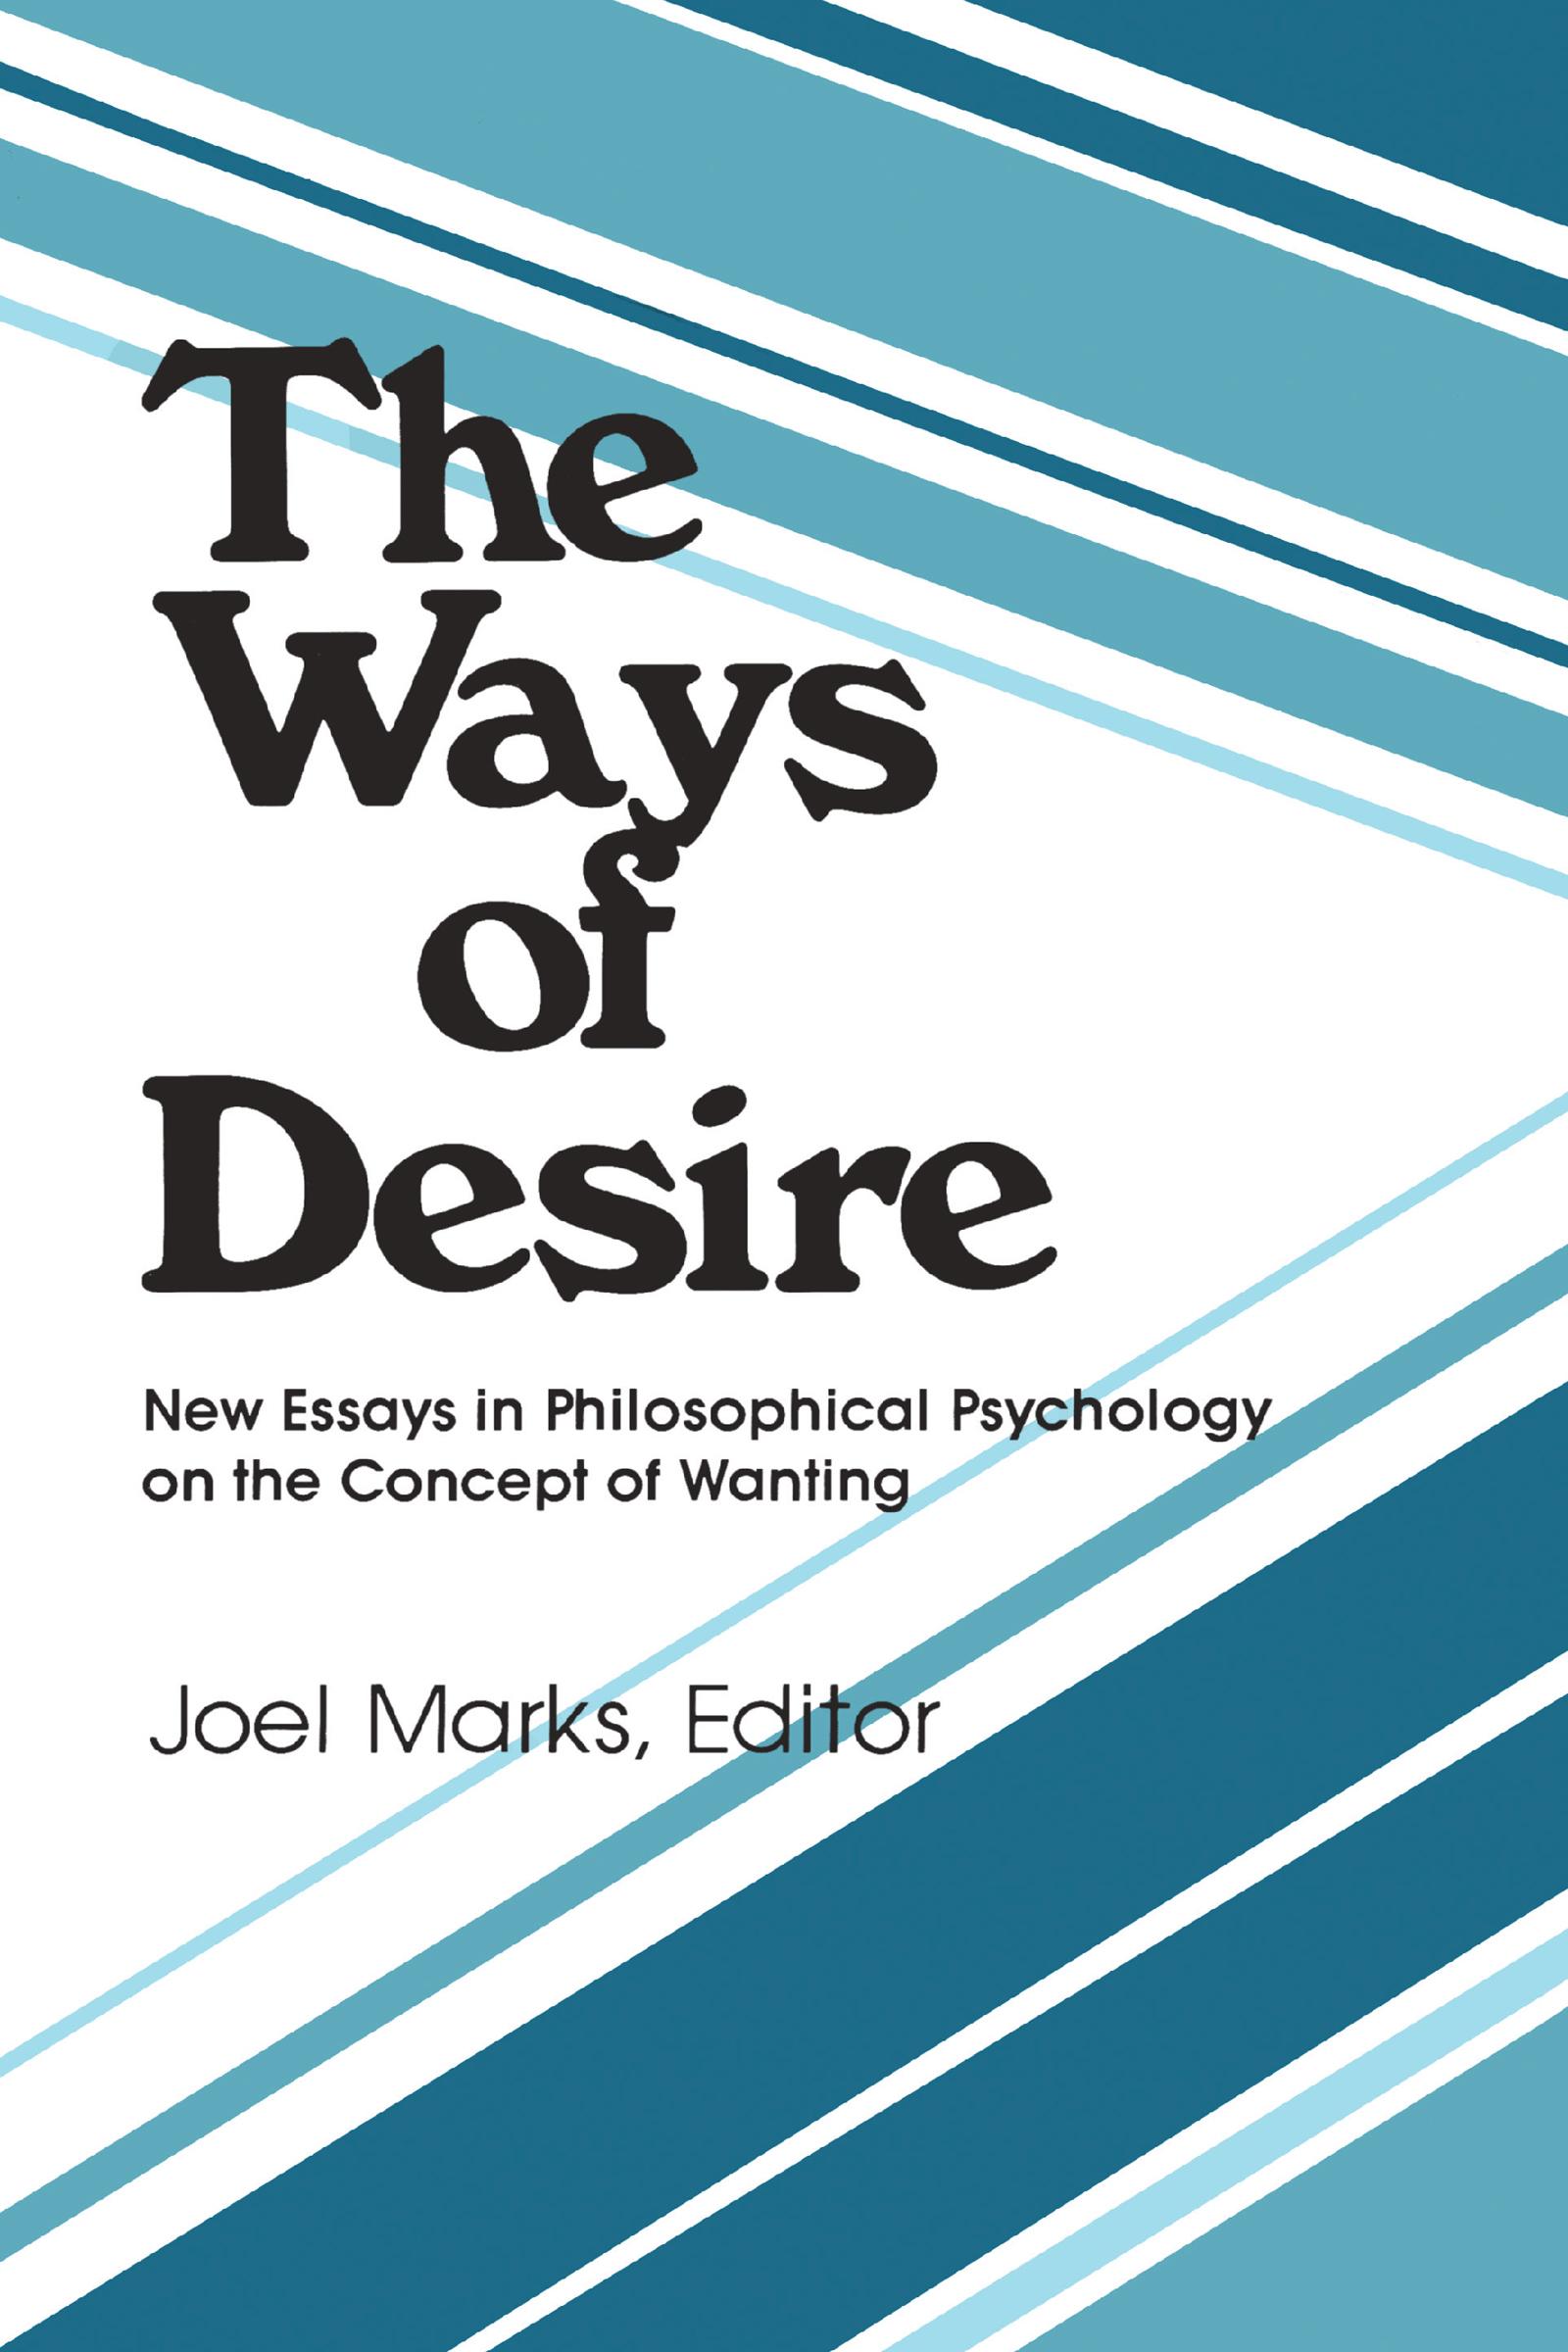 The Ways of Desire